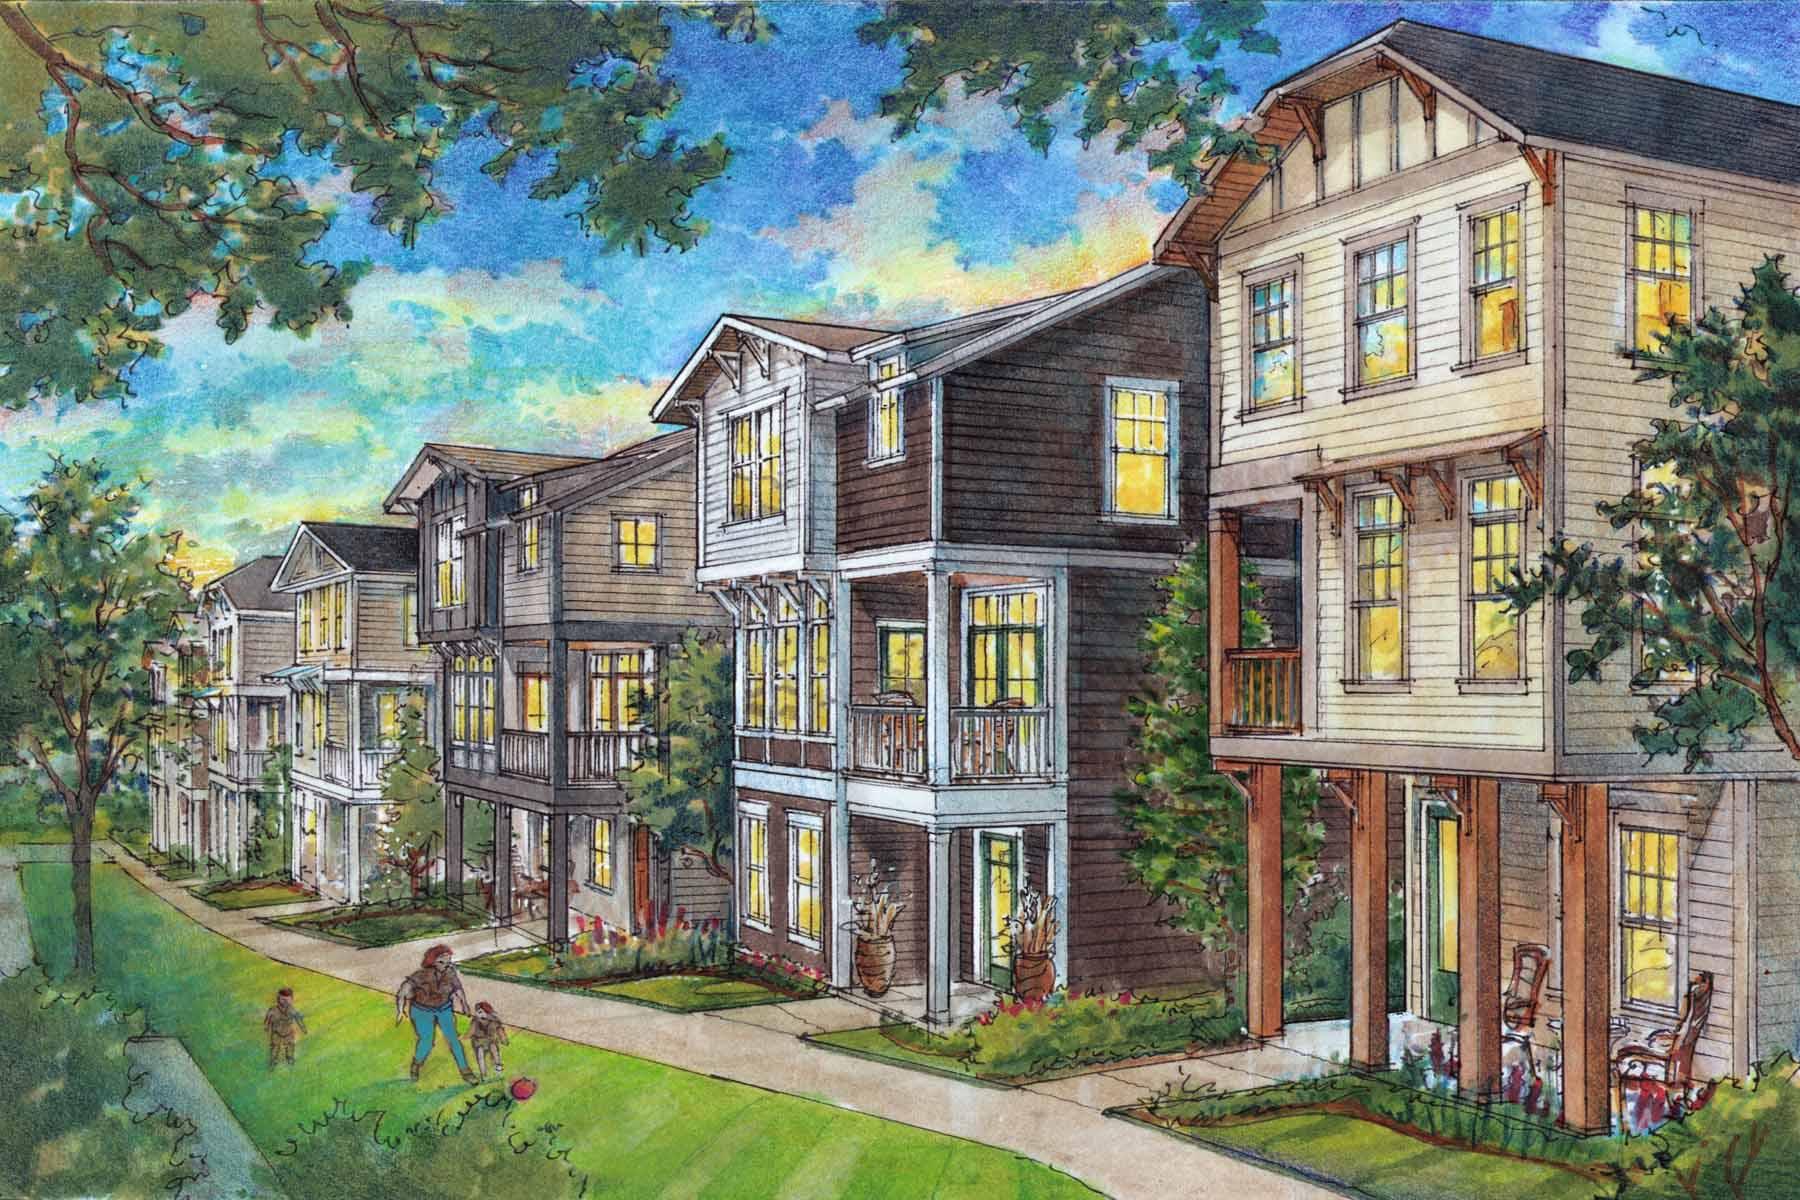 獨棟家庭住宅 為 出售 在 Cottage in The Grove at Avondale 2838 Haven Lane Decatur, 喬治亞州, 30030 美國